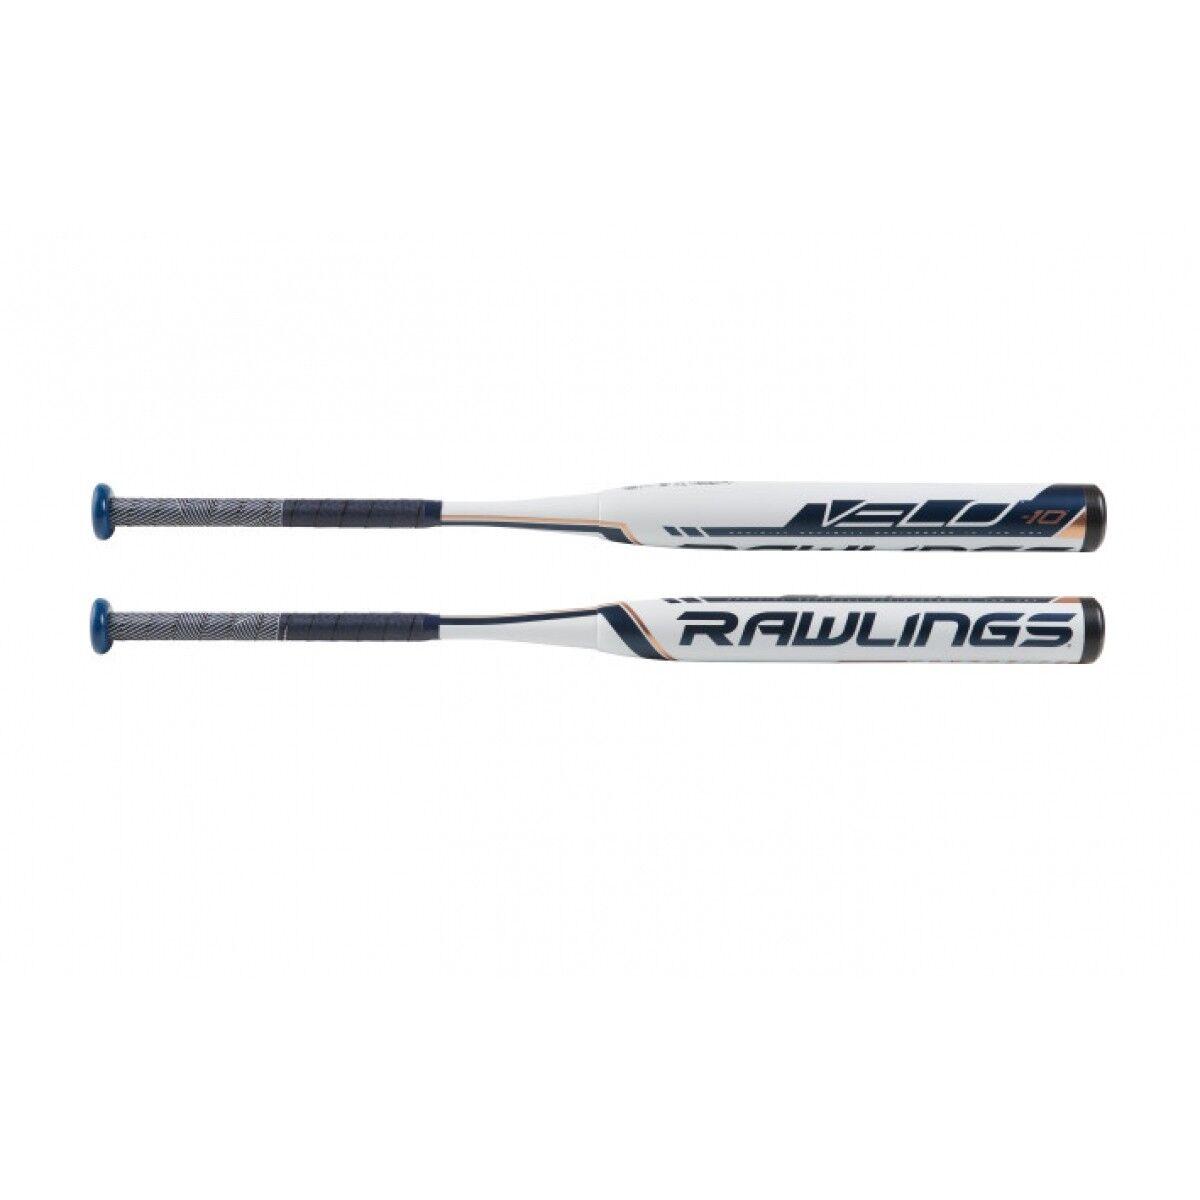 2019 Rawlings Velo -10 (2 1 4″) Fastpitch Softball Bat FP9V10 34 24